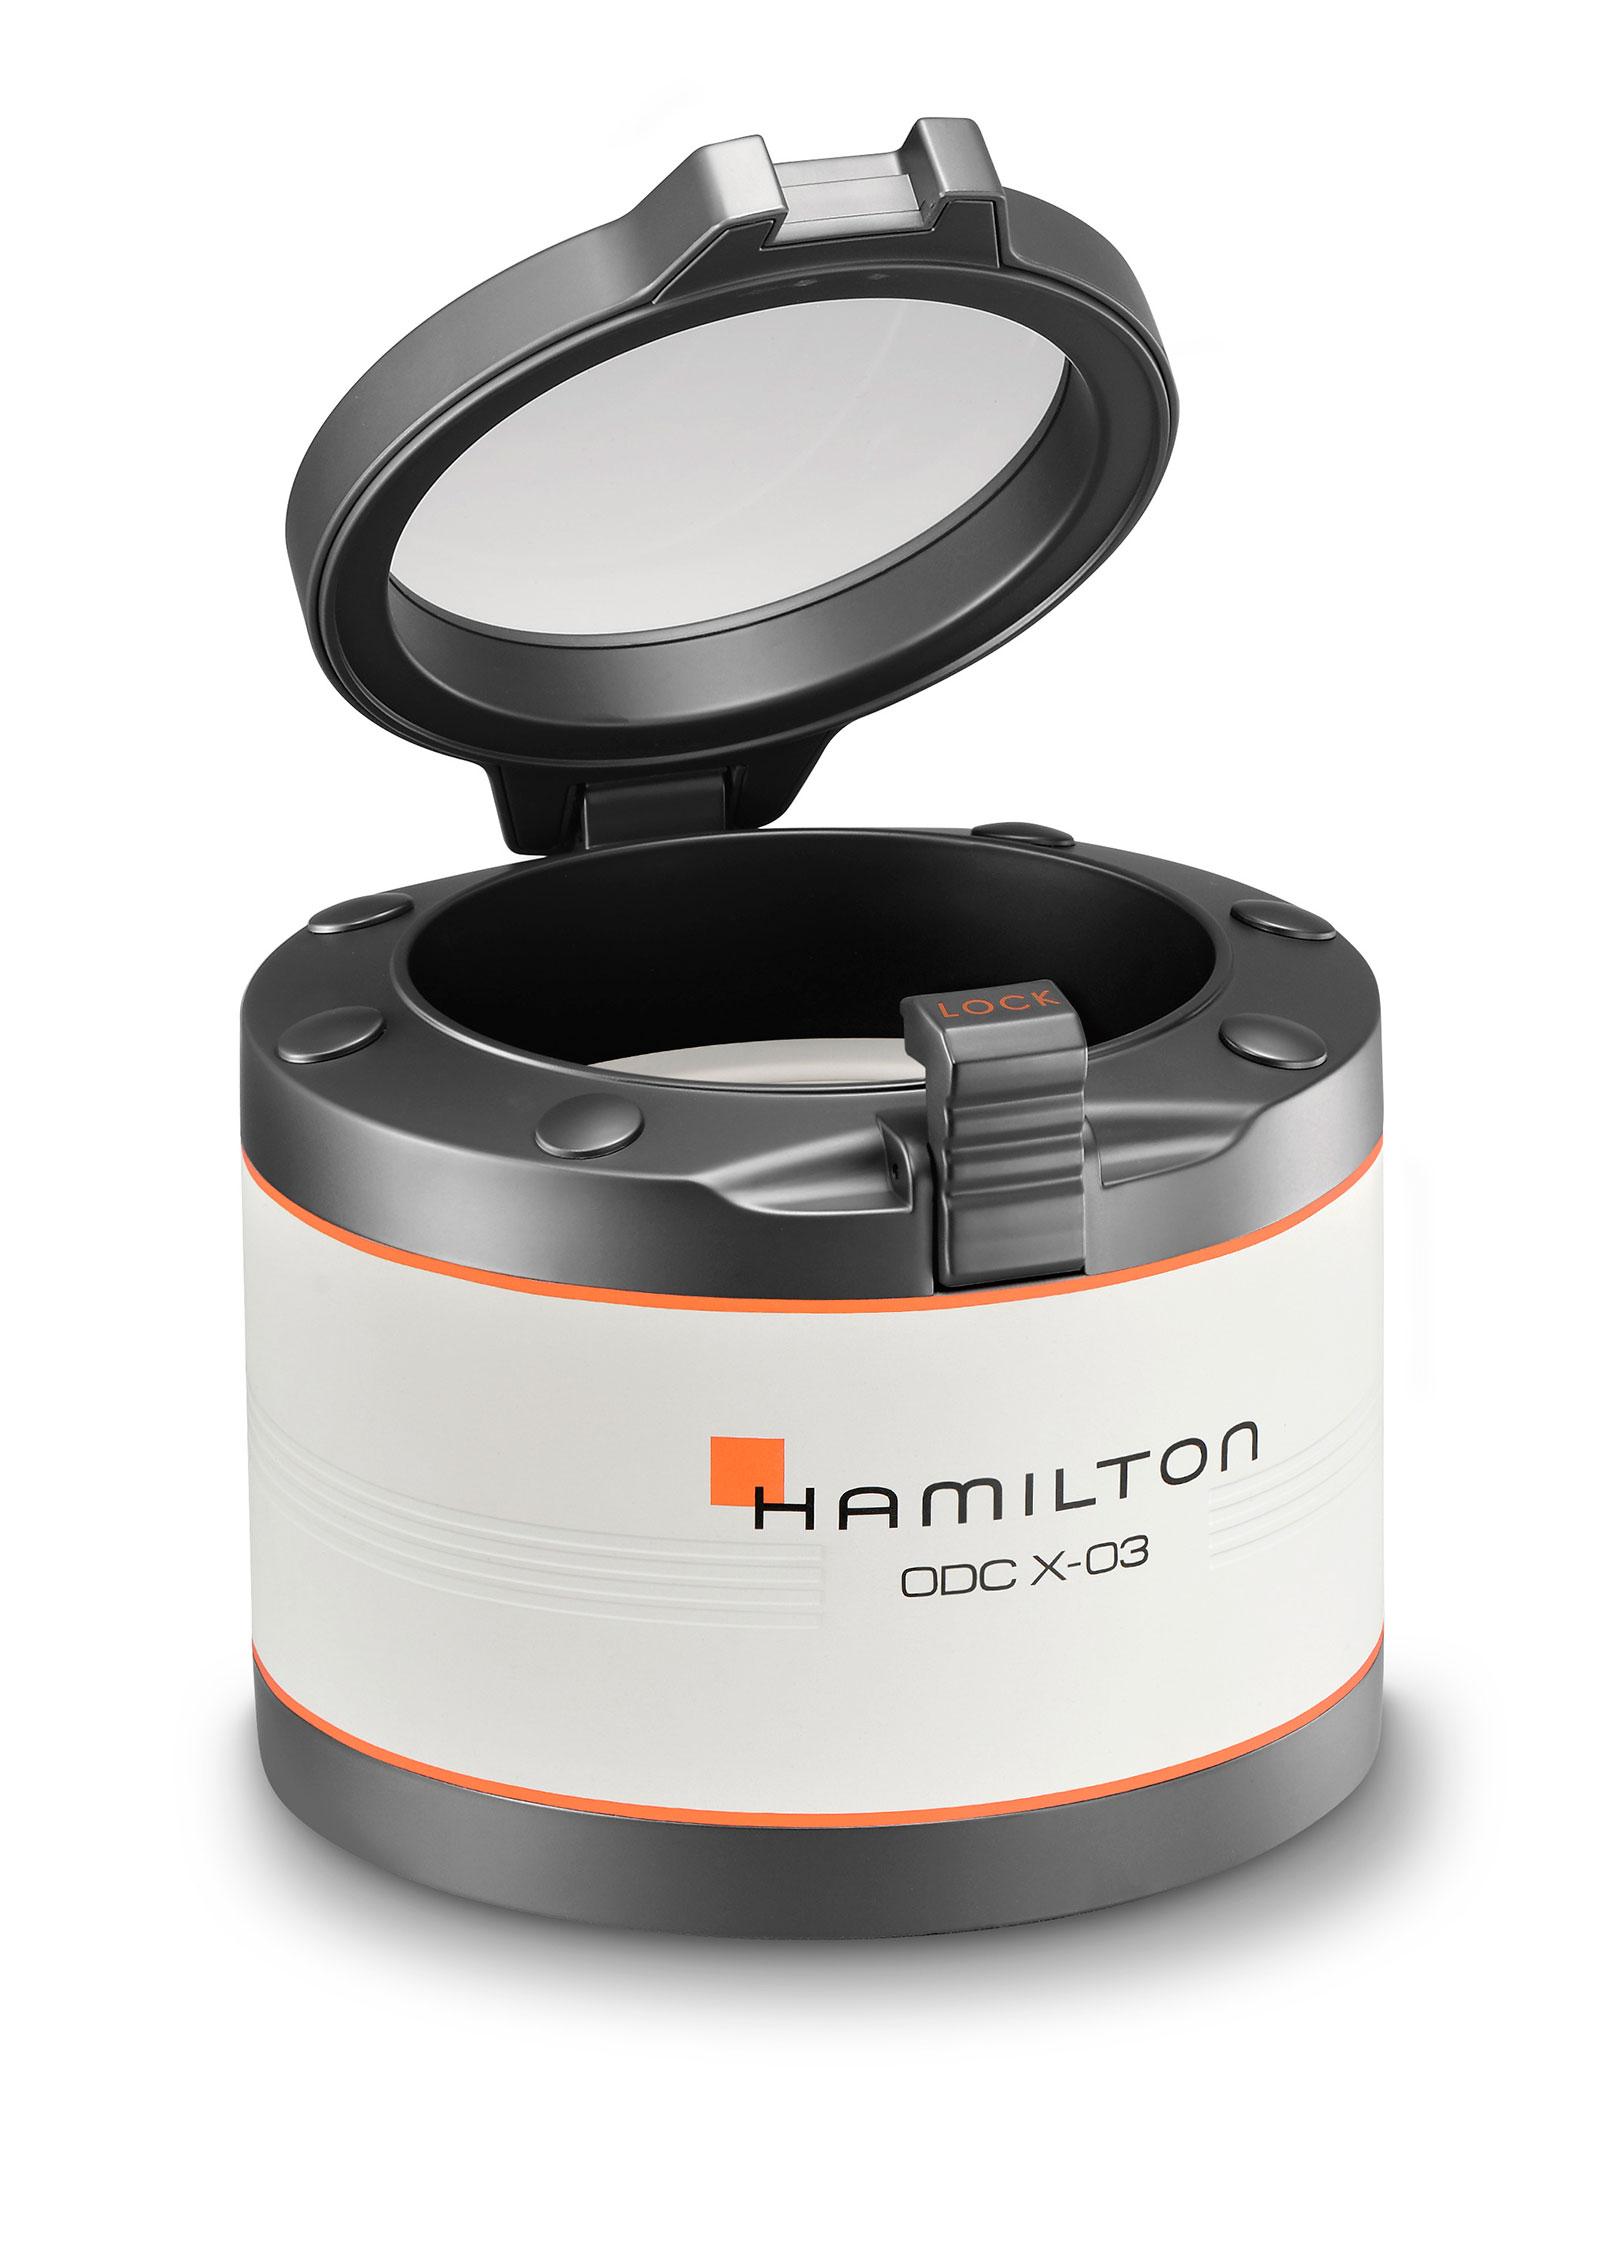 Hamilton ODC X-03 Interstellar 5